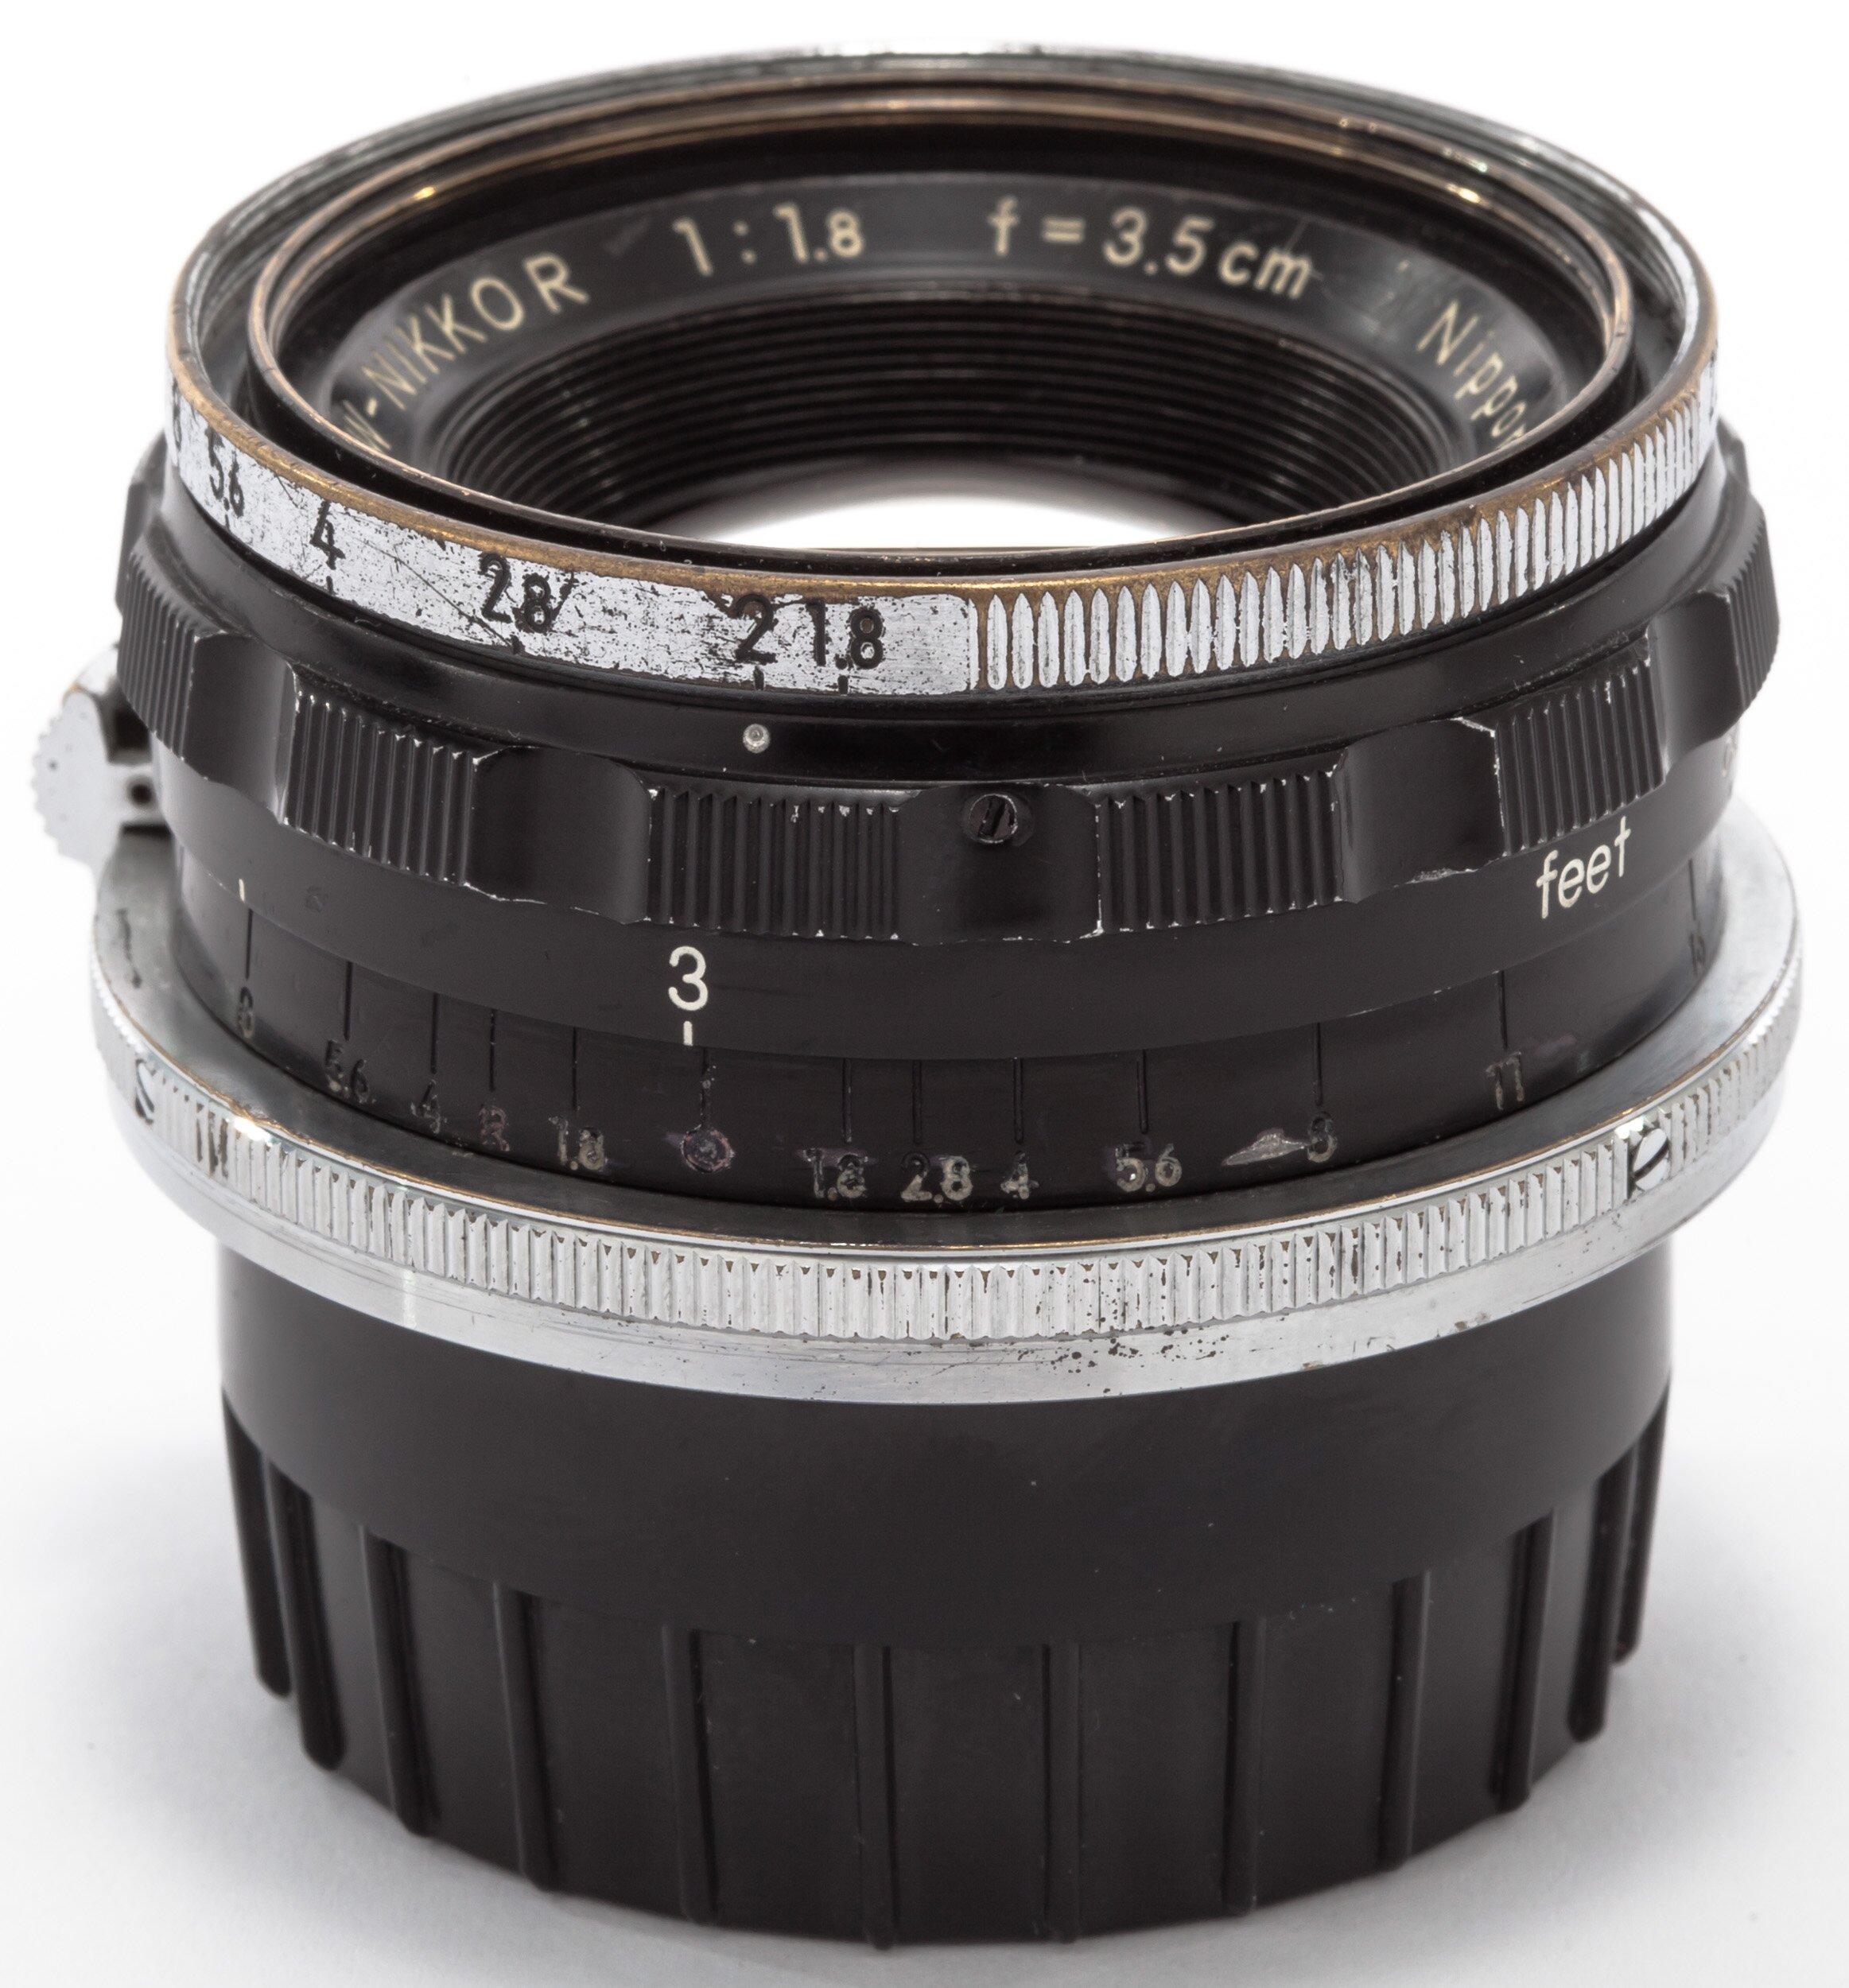 Nikon RF 3,5cm 1,8 W-Nikkor Nippon Kogaku